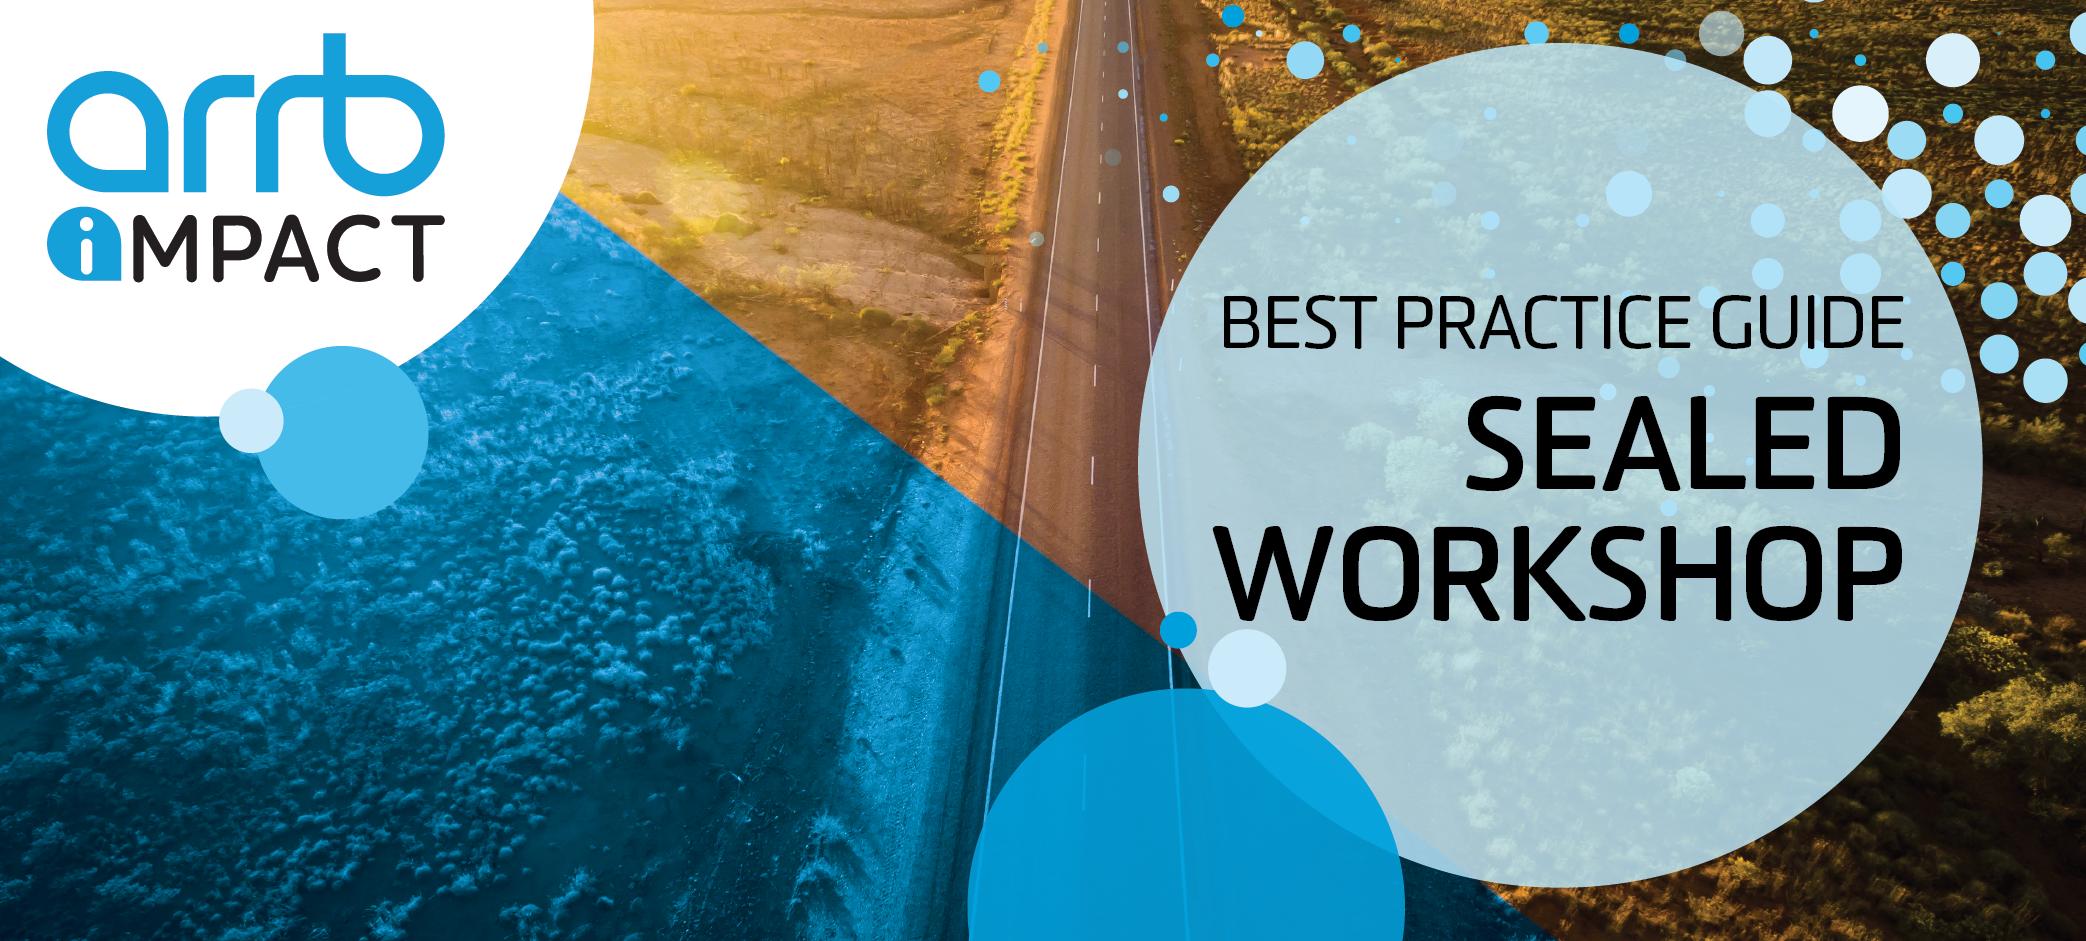 Best Practice Guide: Sealed Workshop Adelaide